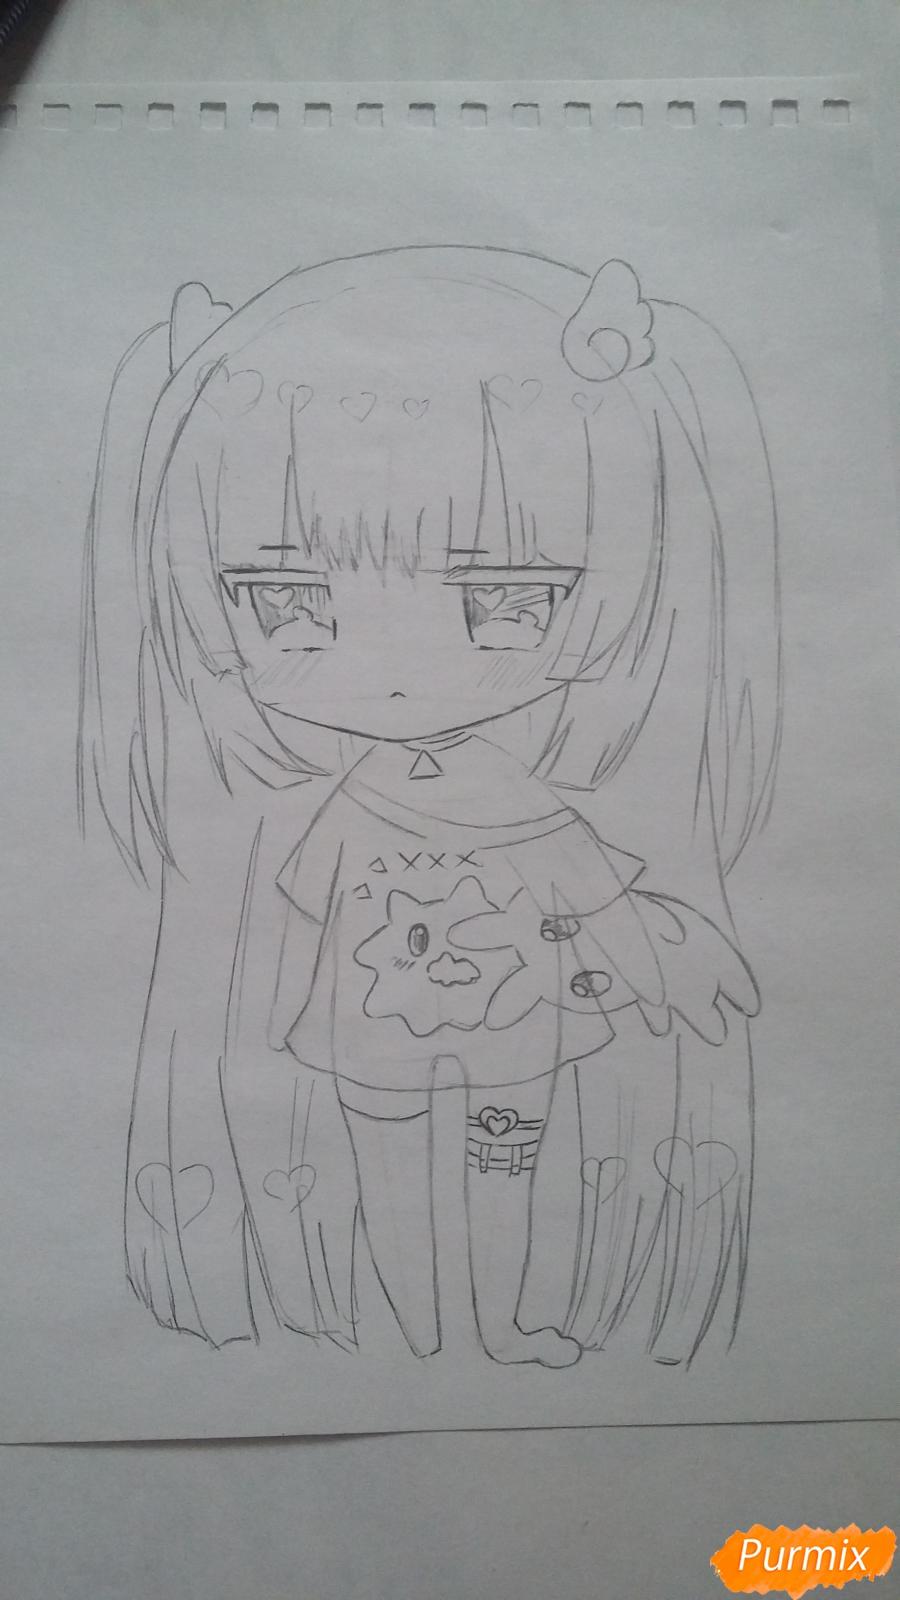 Рисуем милую чиби-тян в пижаме и игрушкой в руке карандашами - шаг 8